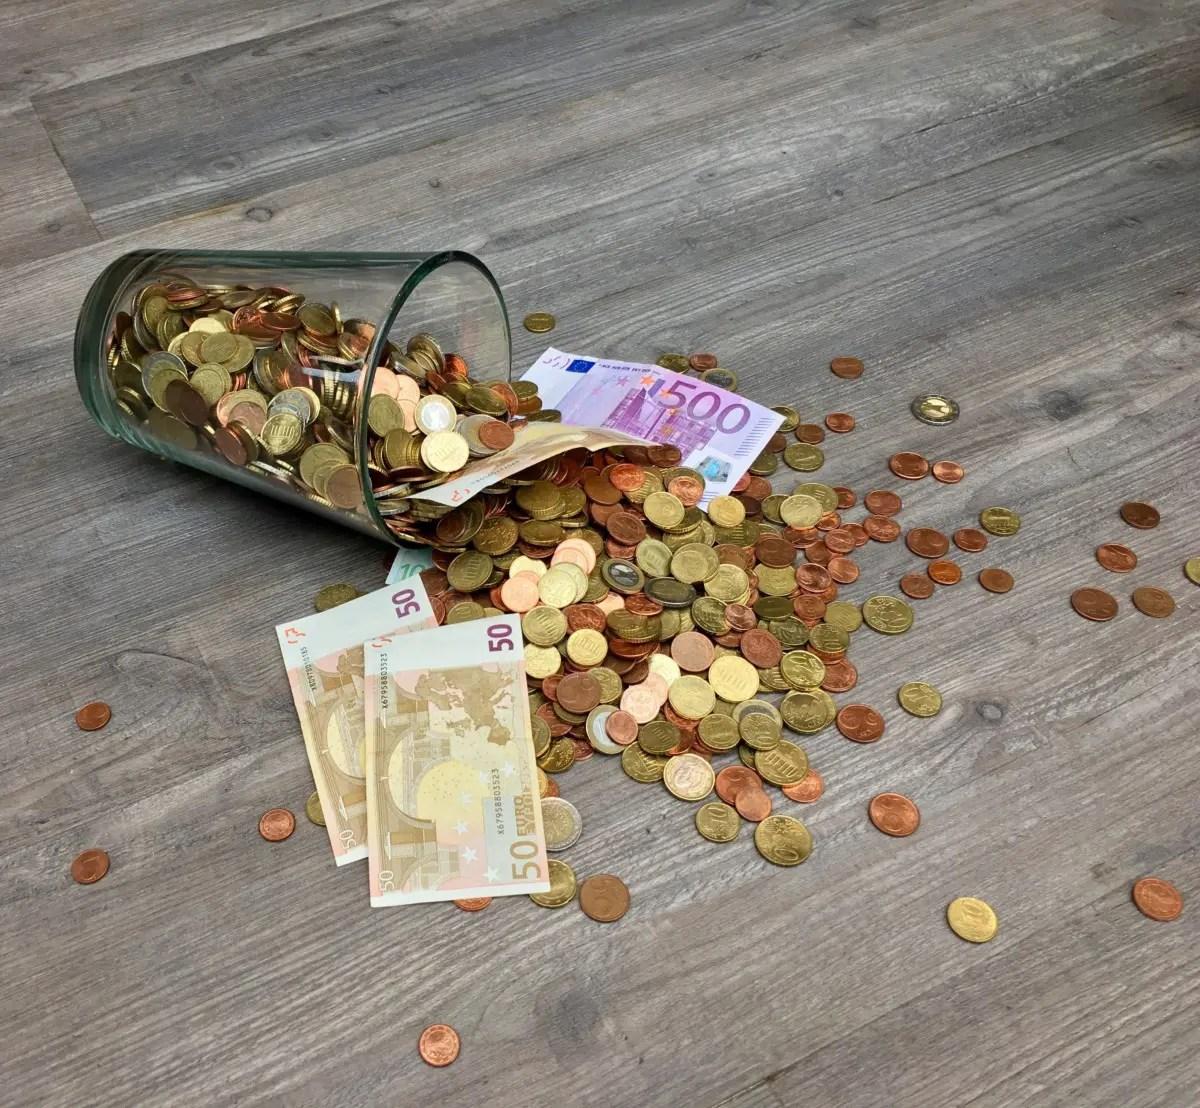 Kontenfuchs.de Konten  PSD2 mobile Payment kontaktloses Bezahlen Instant Payment google pay BGB Bargeld apple pay 675u